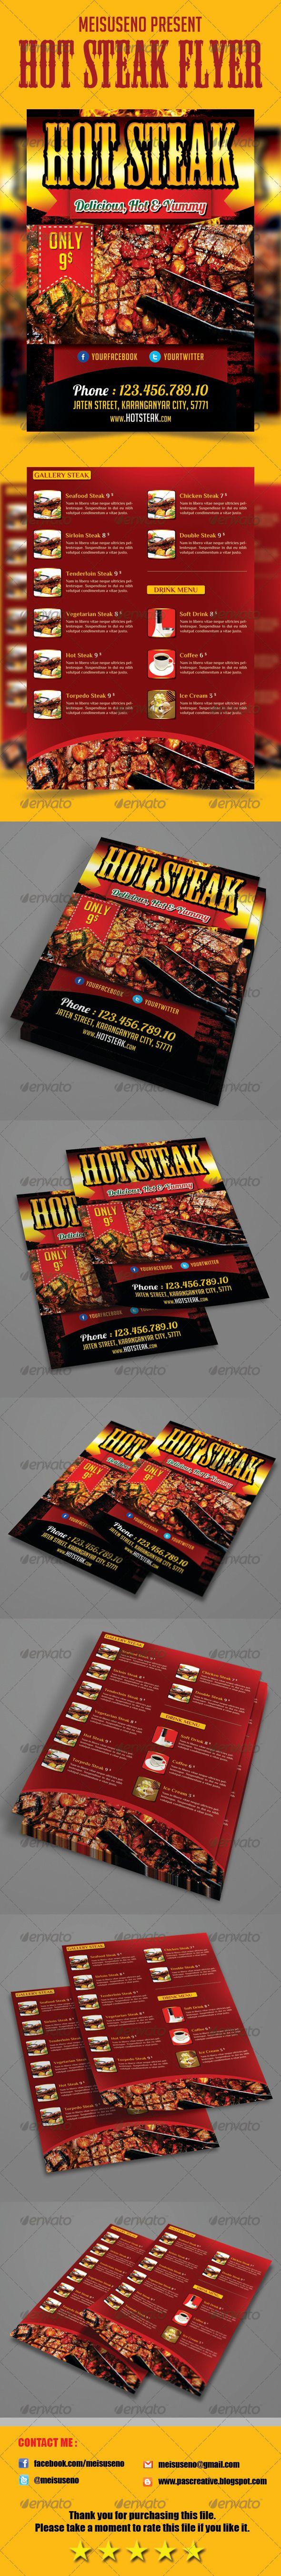 Hot Steak Flyer Template - graphicriver sale